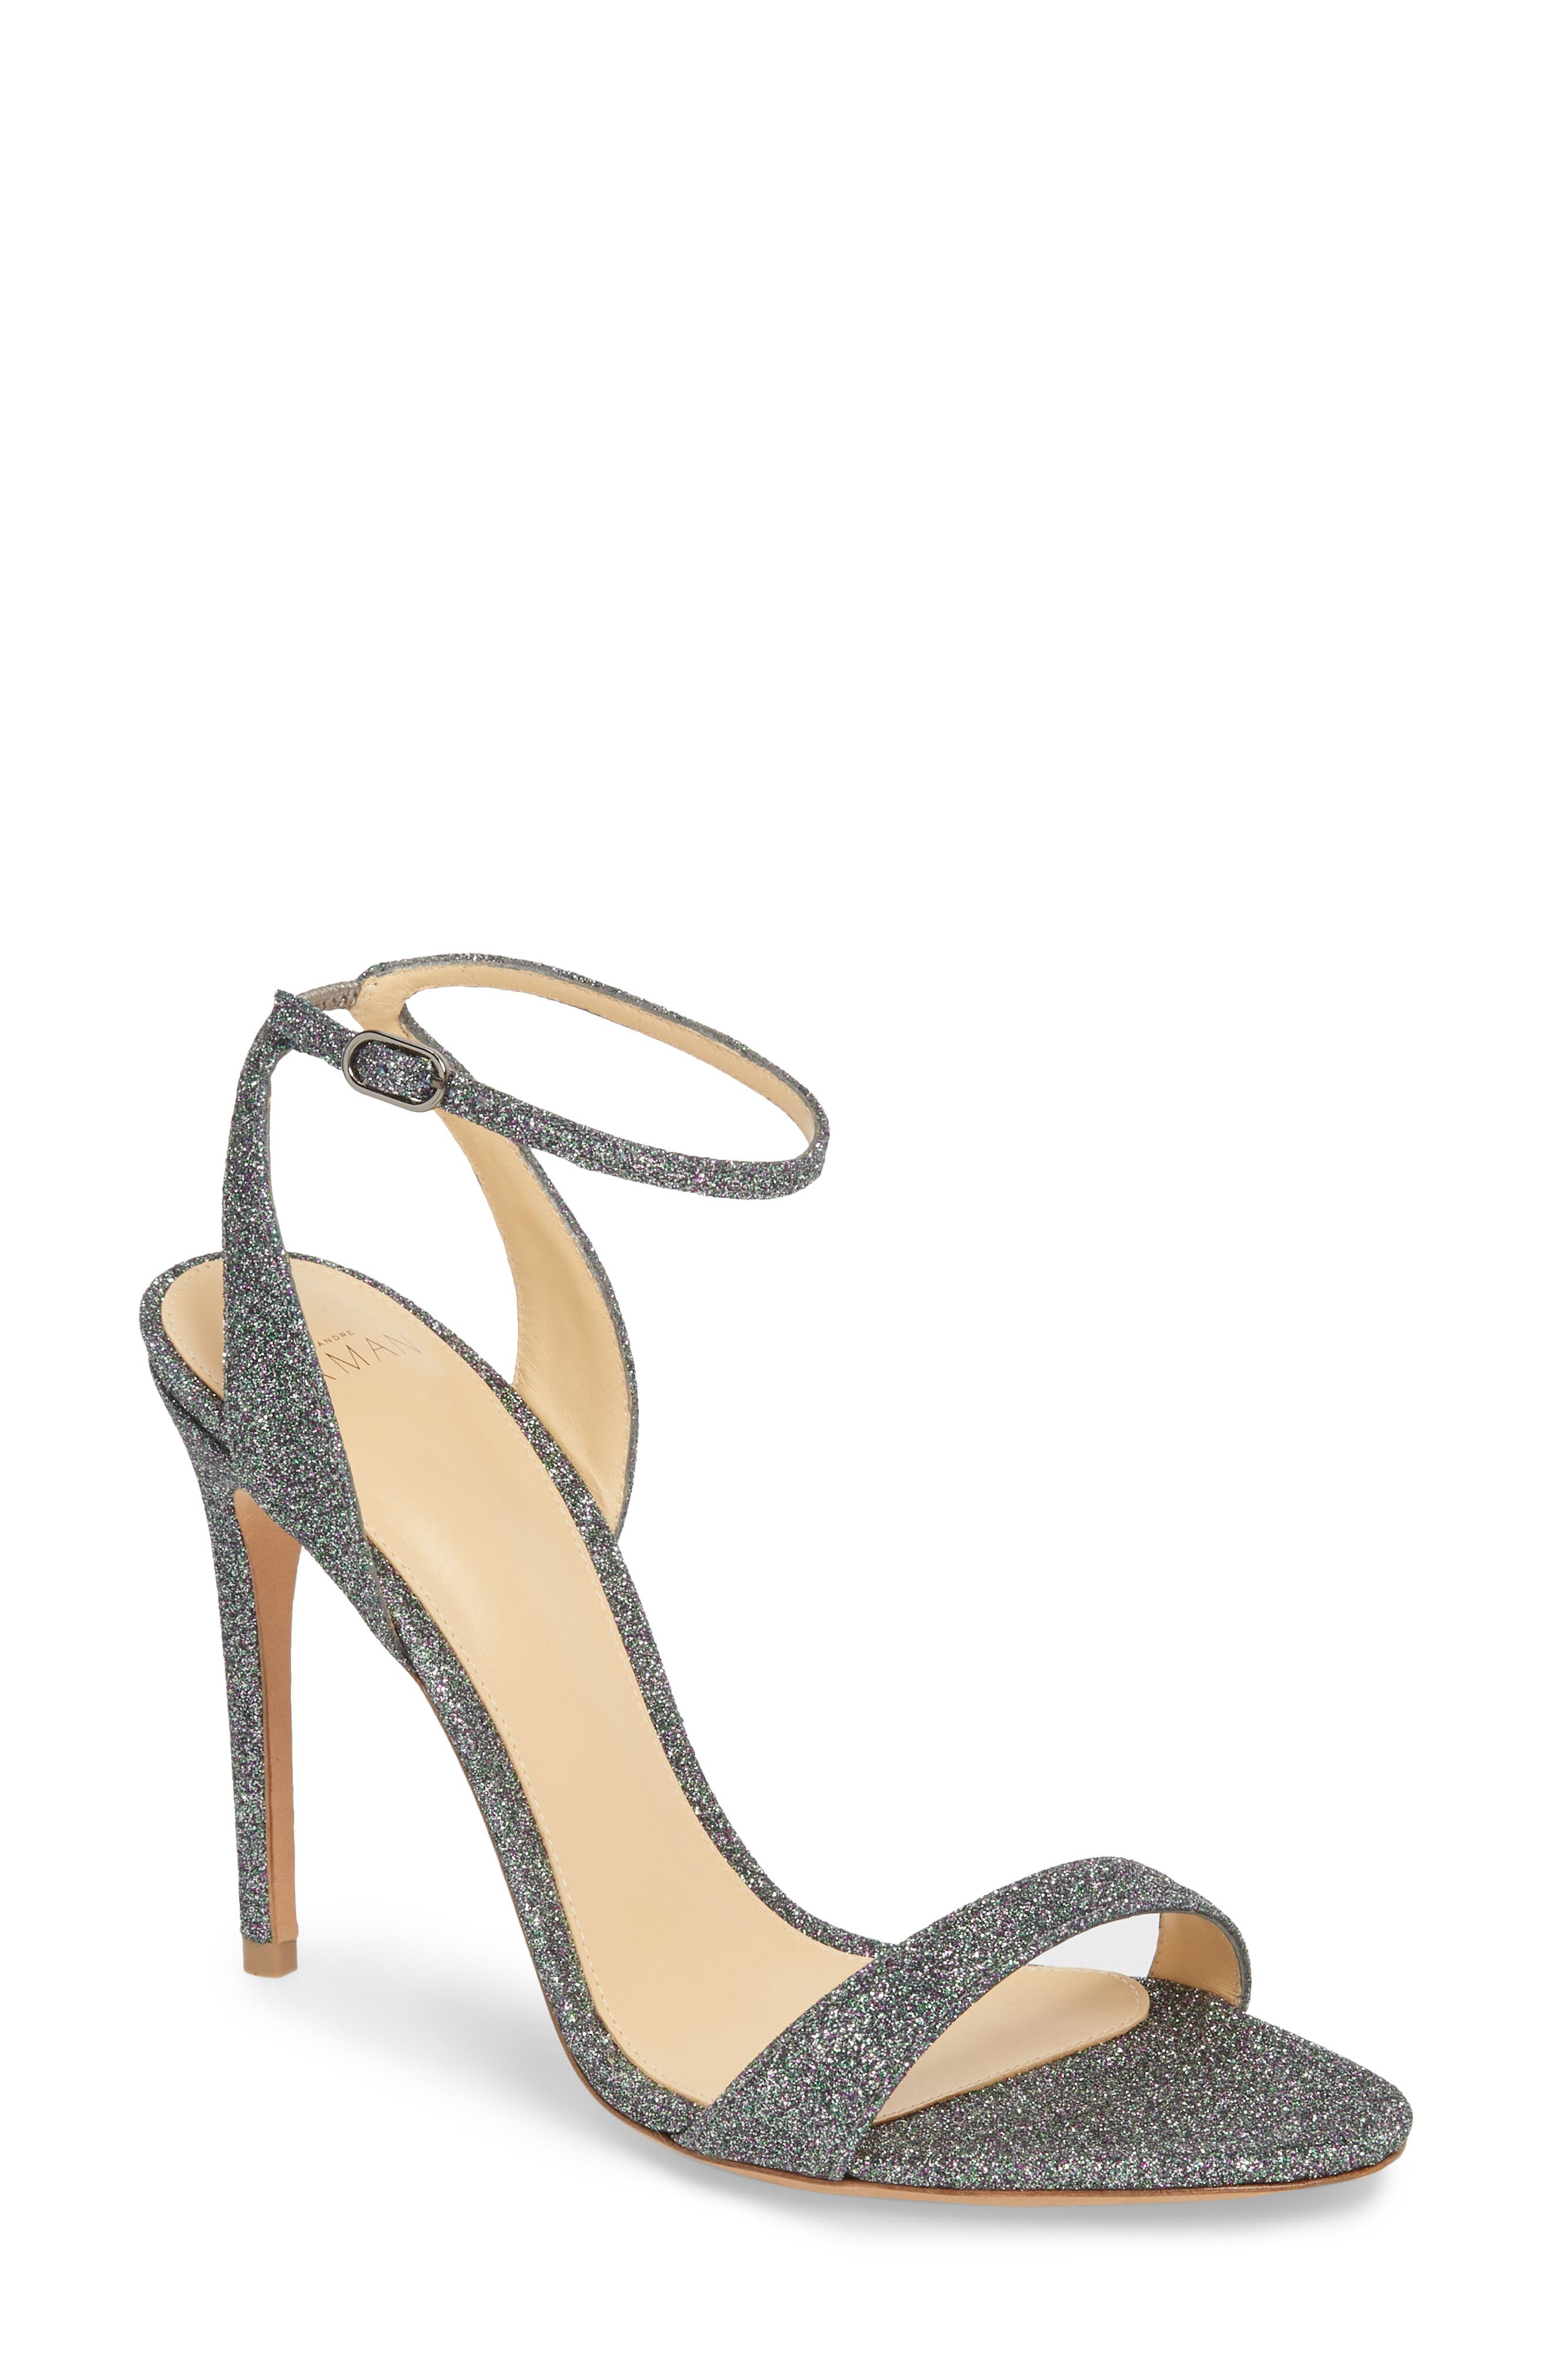 Santine Ankle Strap Sandal,                             Main thumbnail 1, color,                             SILVER